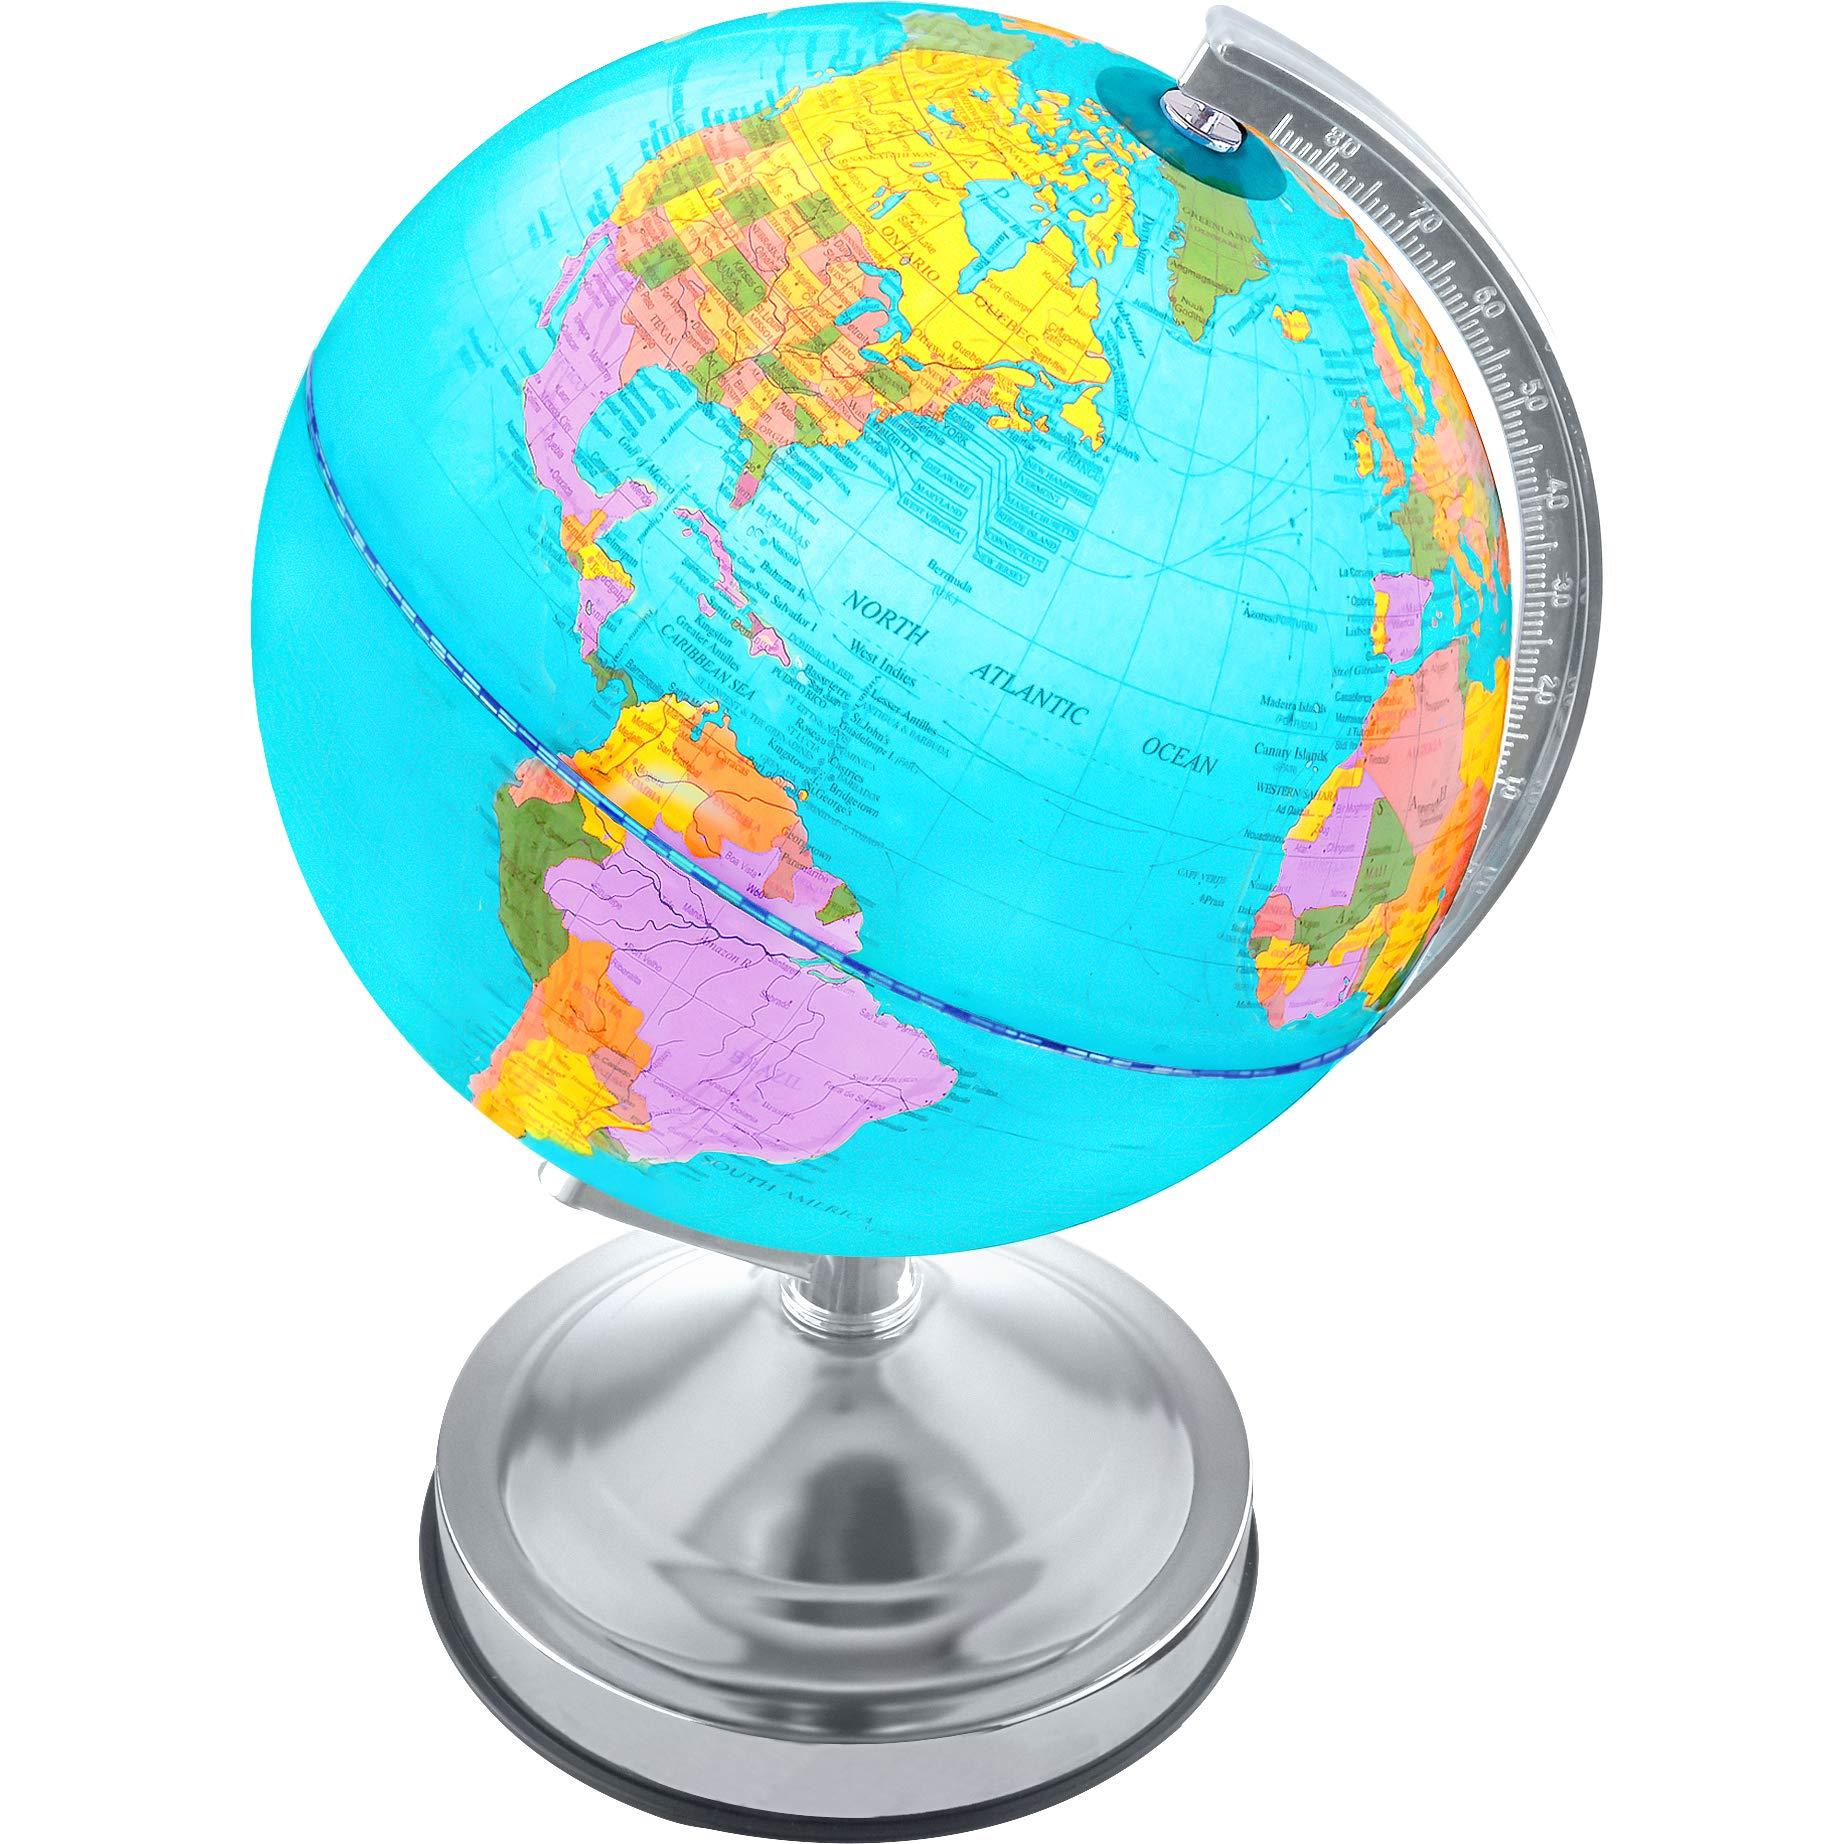 Illuminated Kids Globe Stand Educational